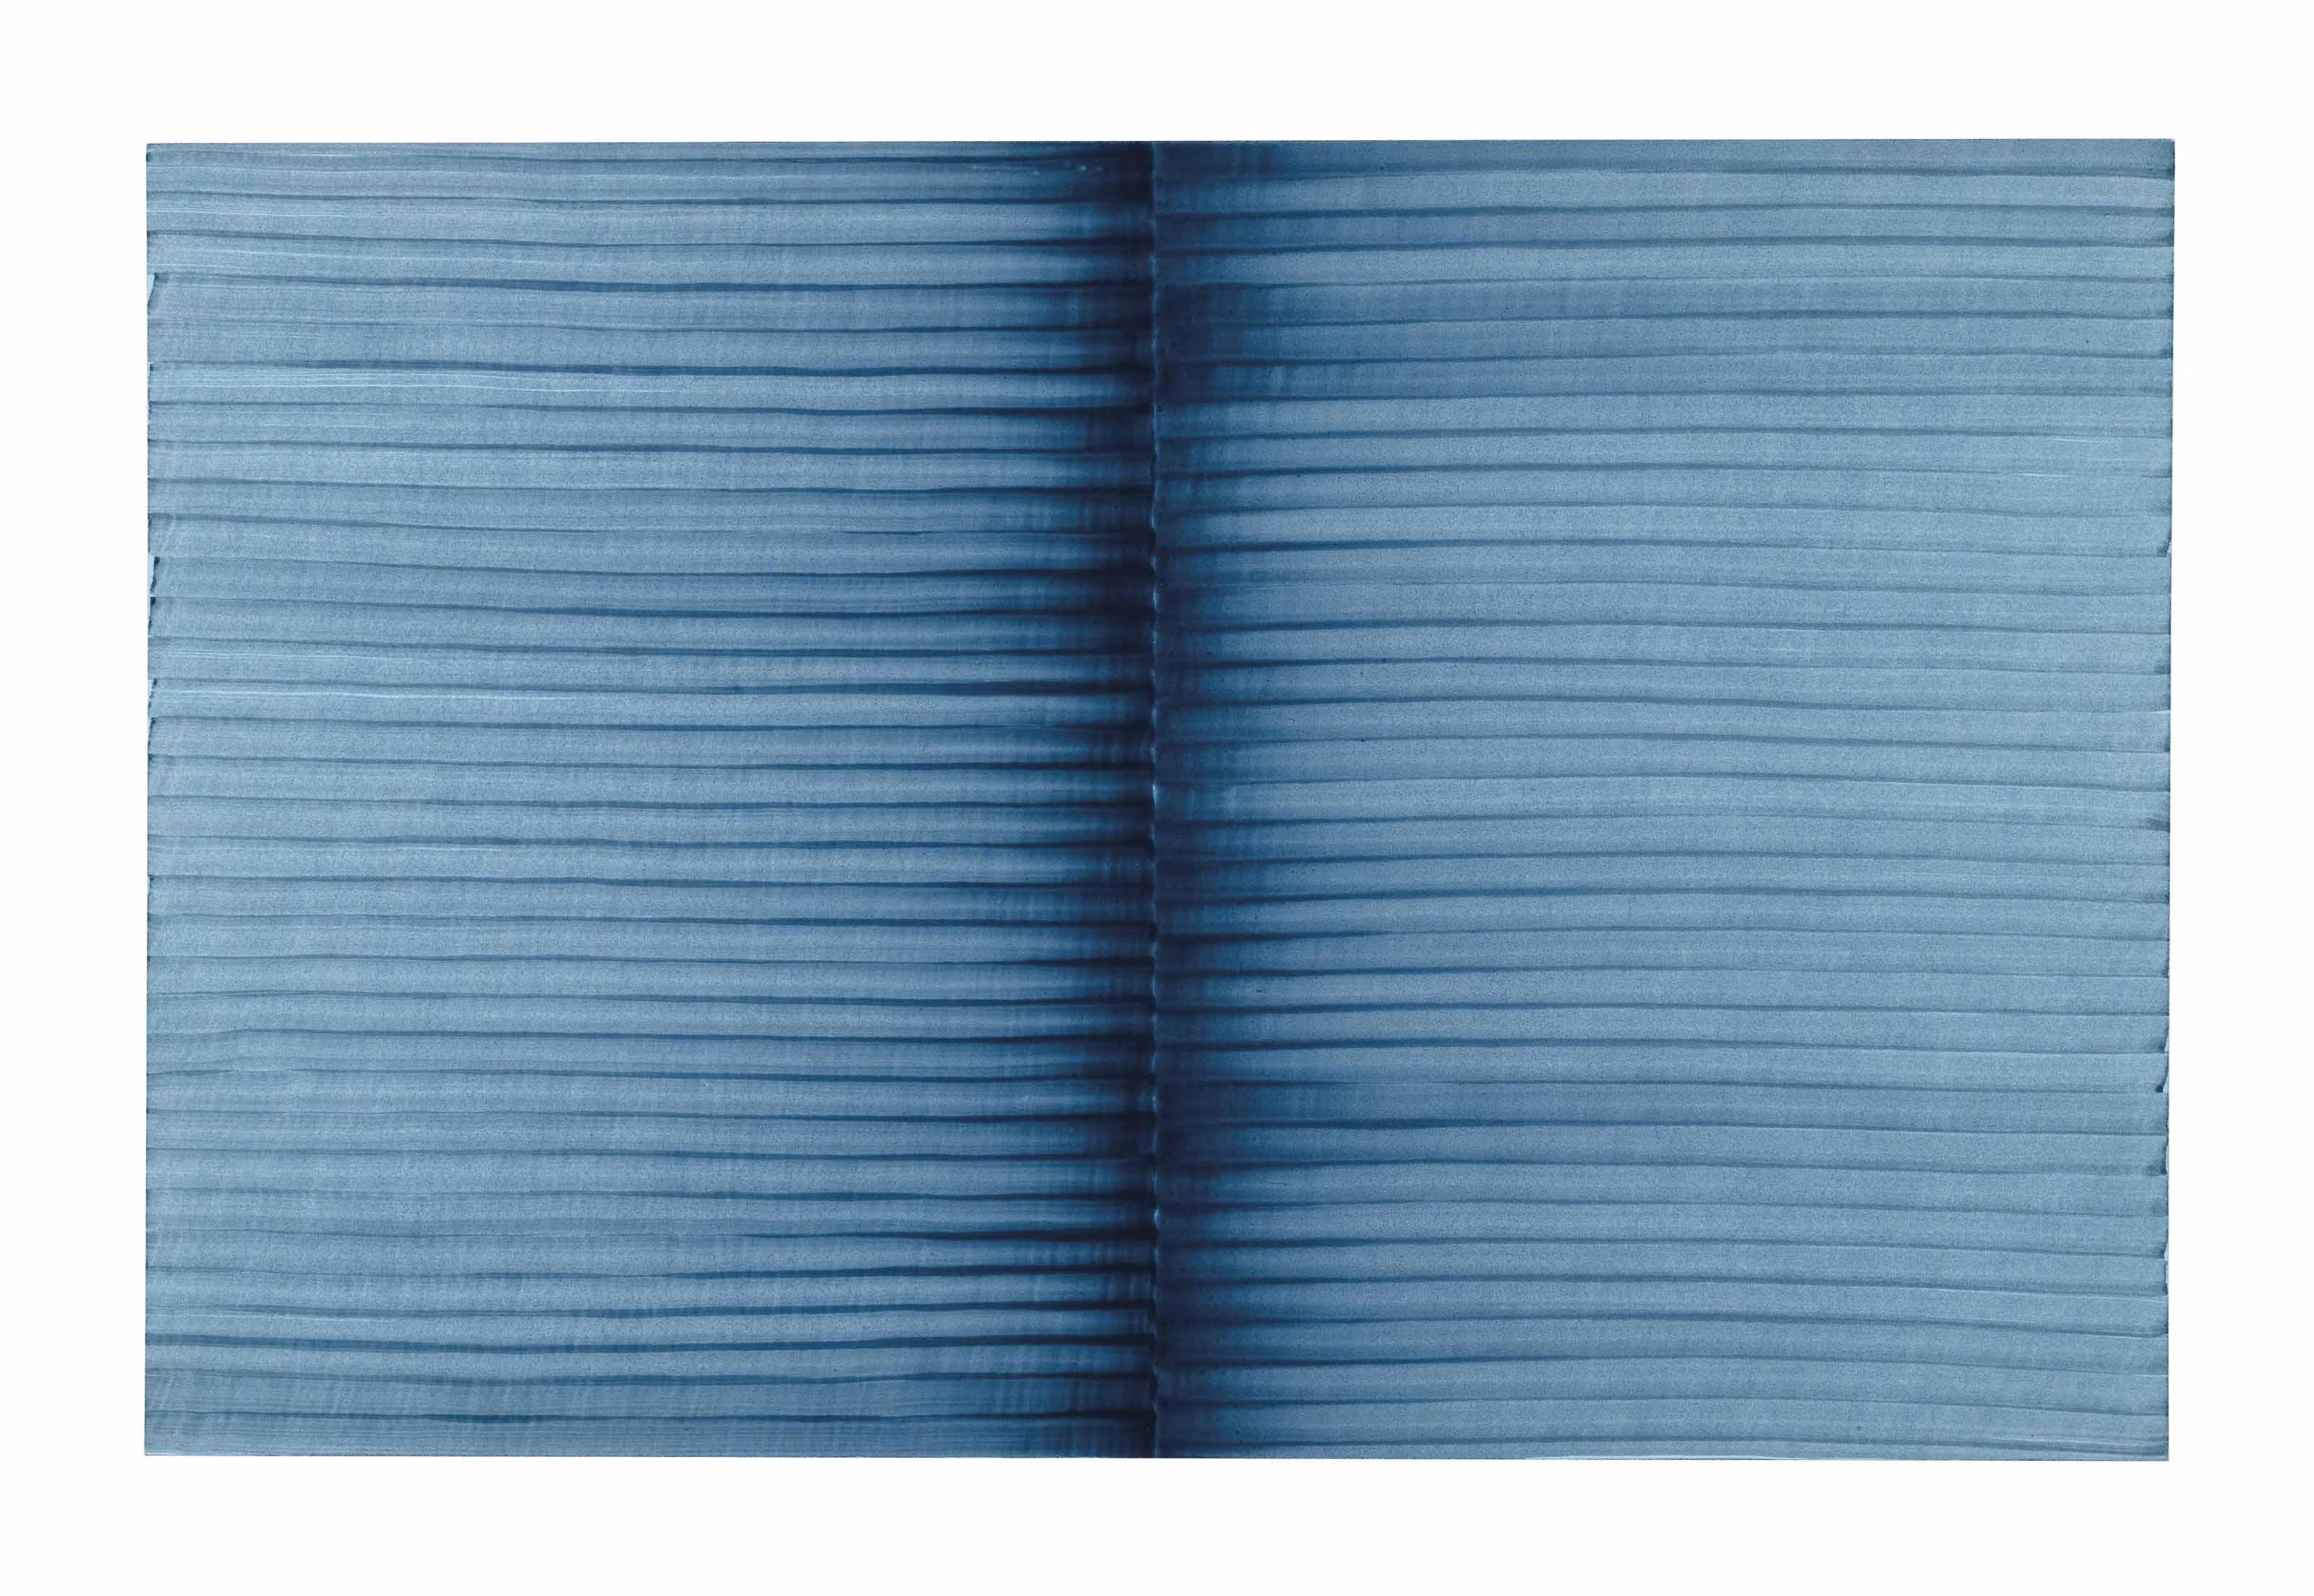 Irma Blank (B. 1934)